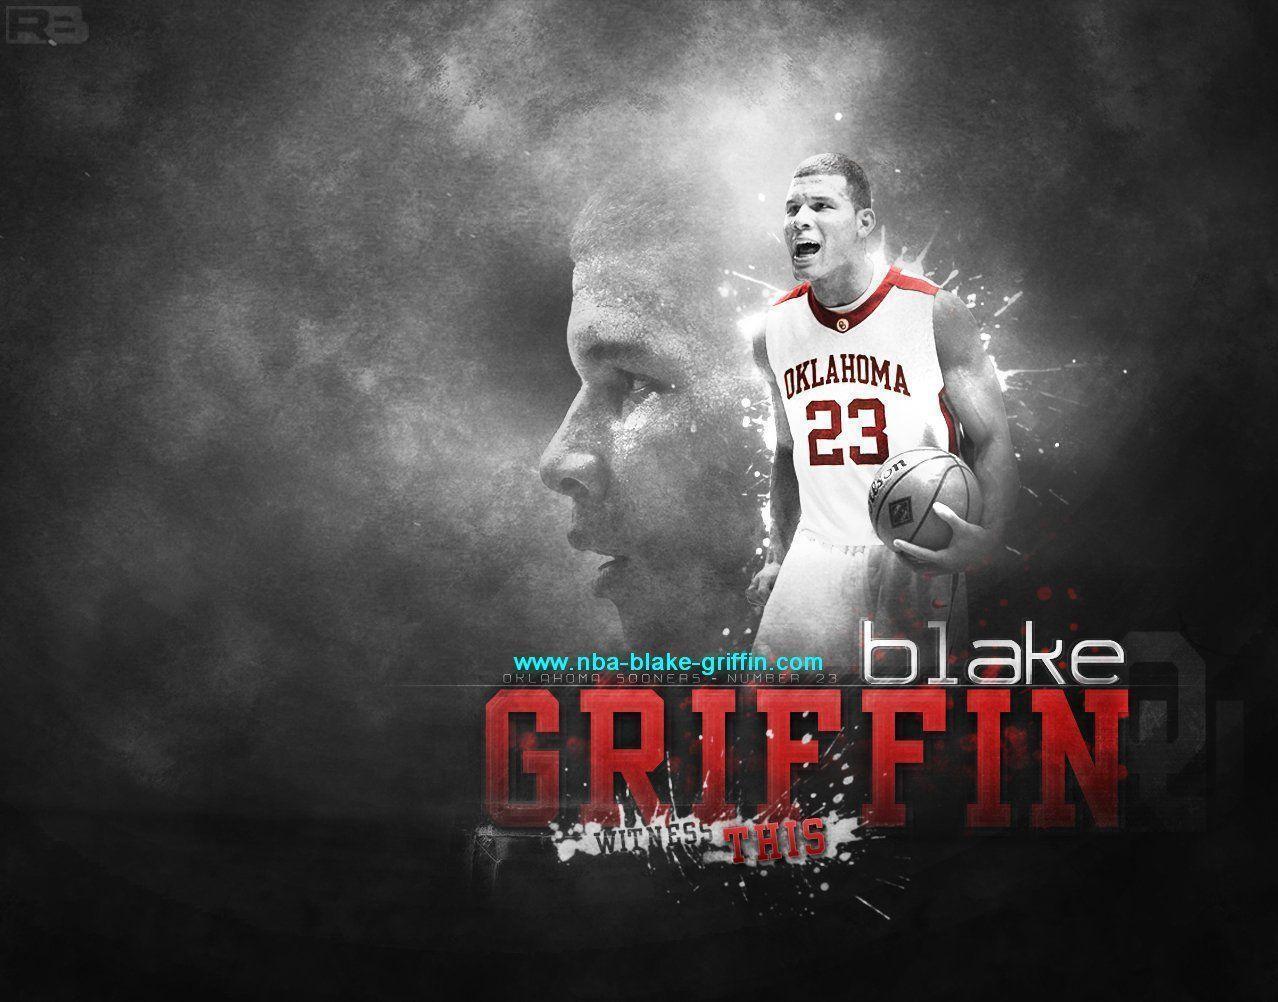 blake griffin wallpaper - photo #18